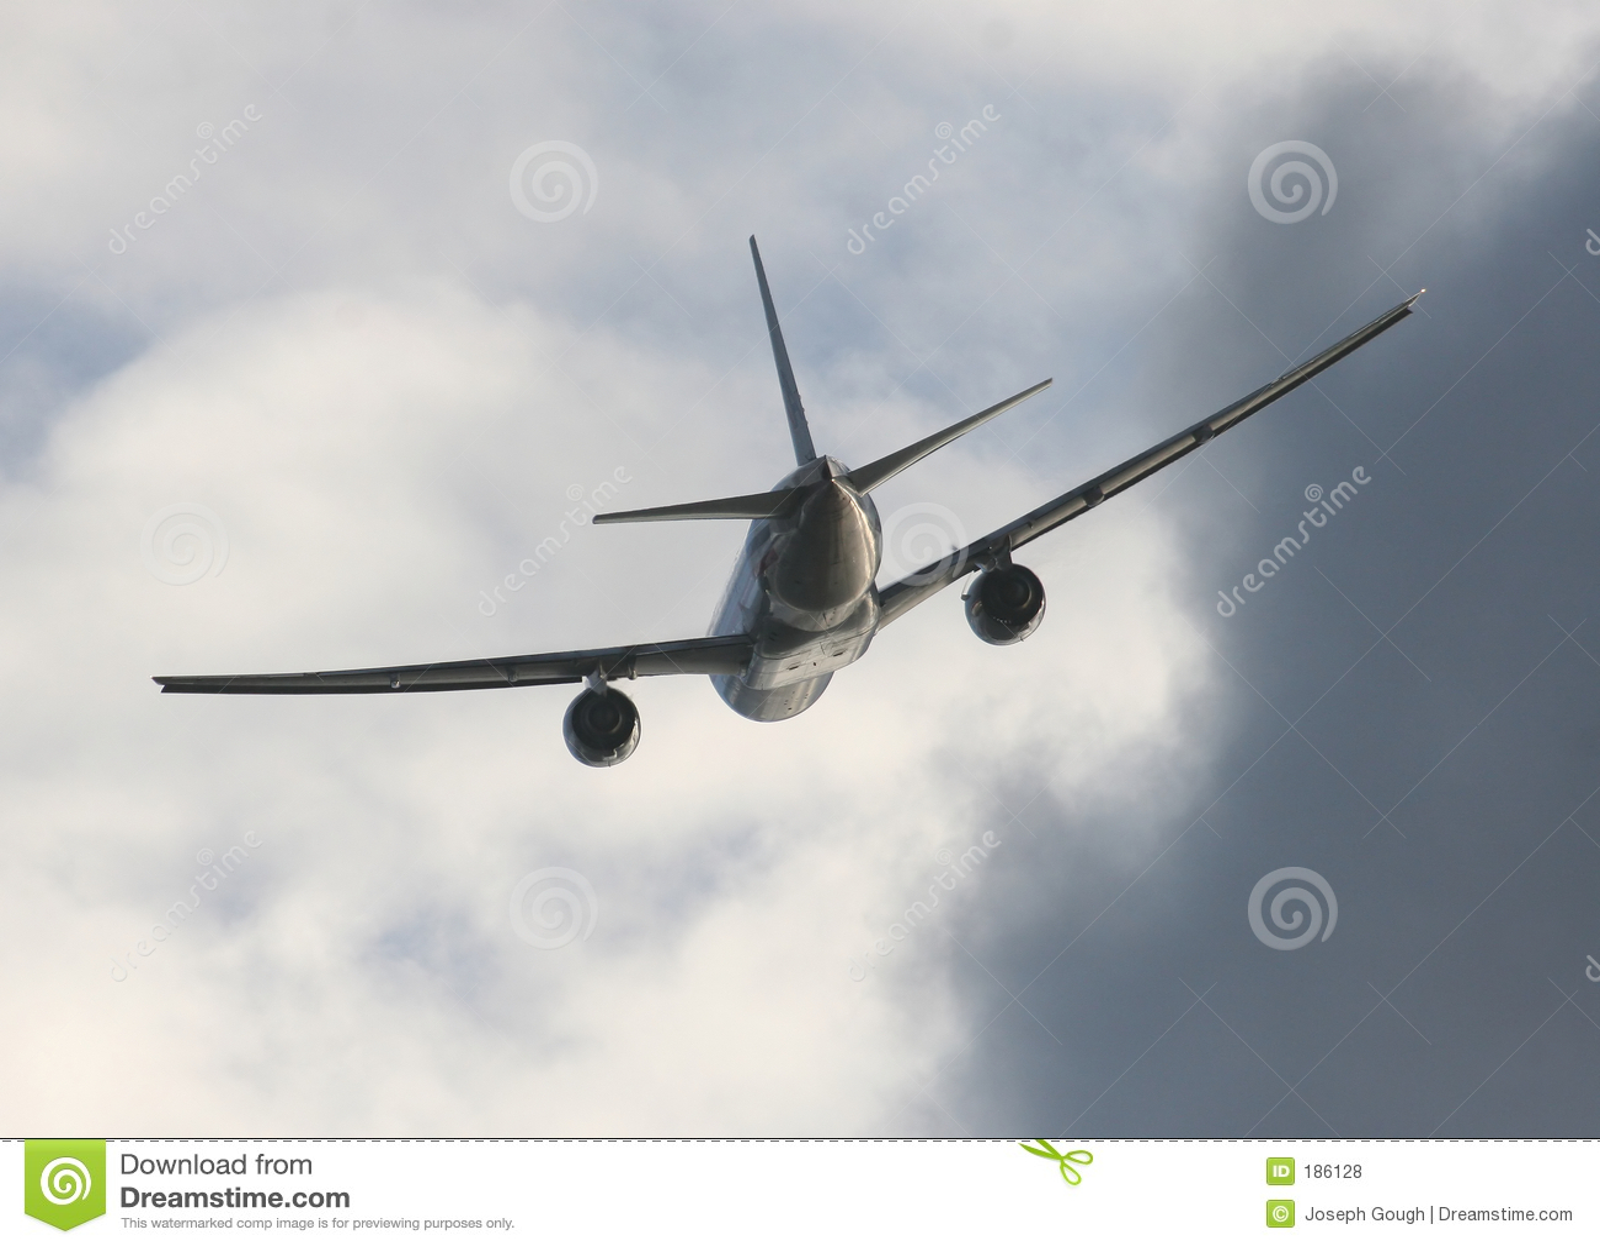 Framåt turbulens